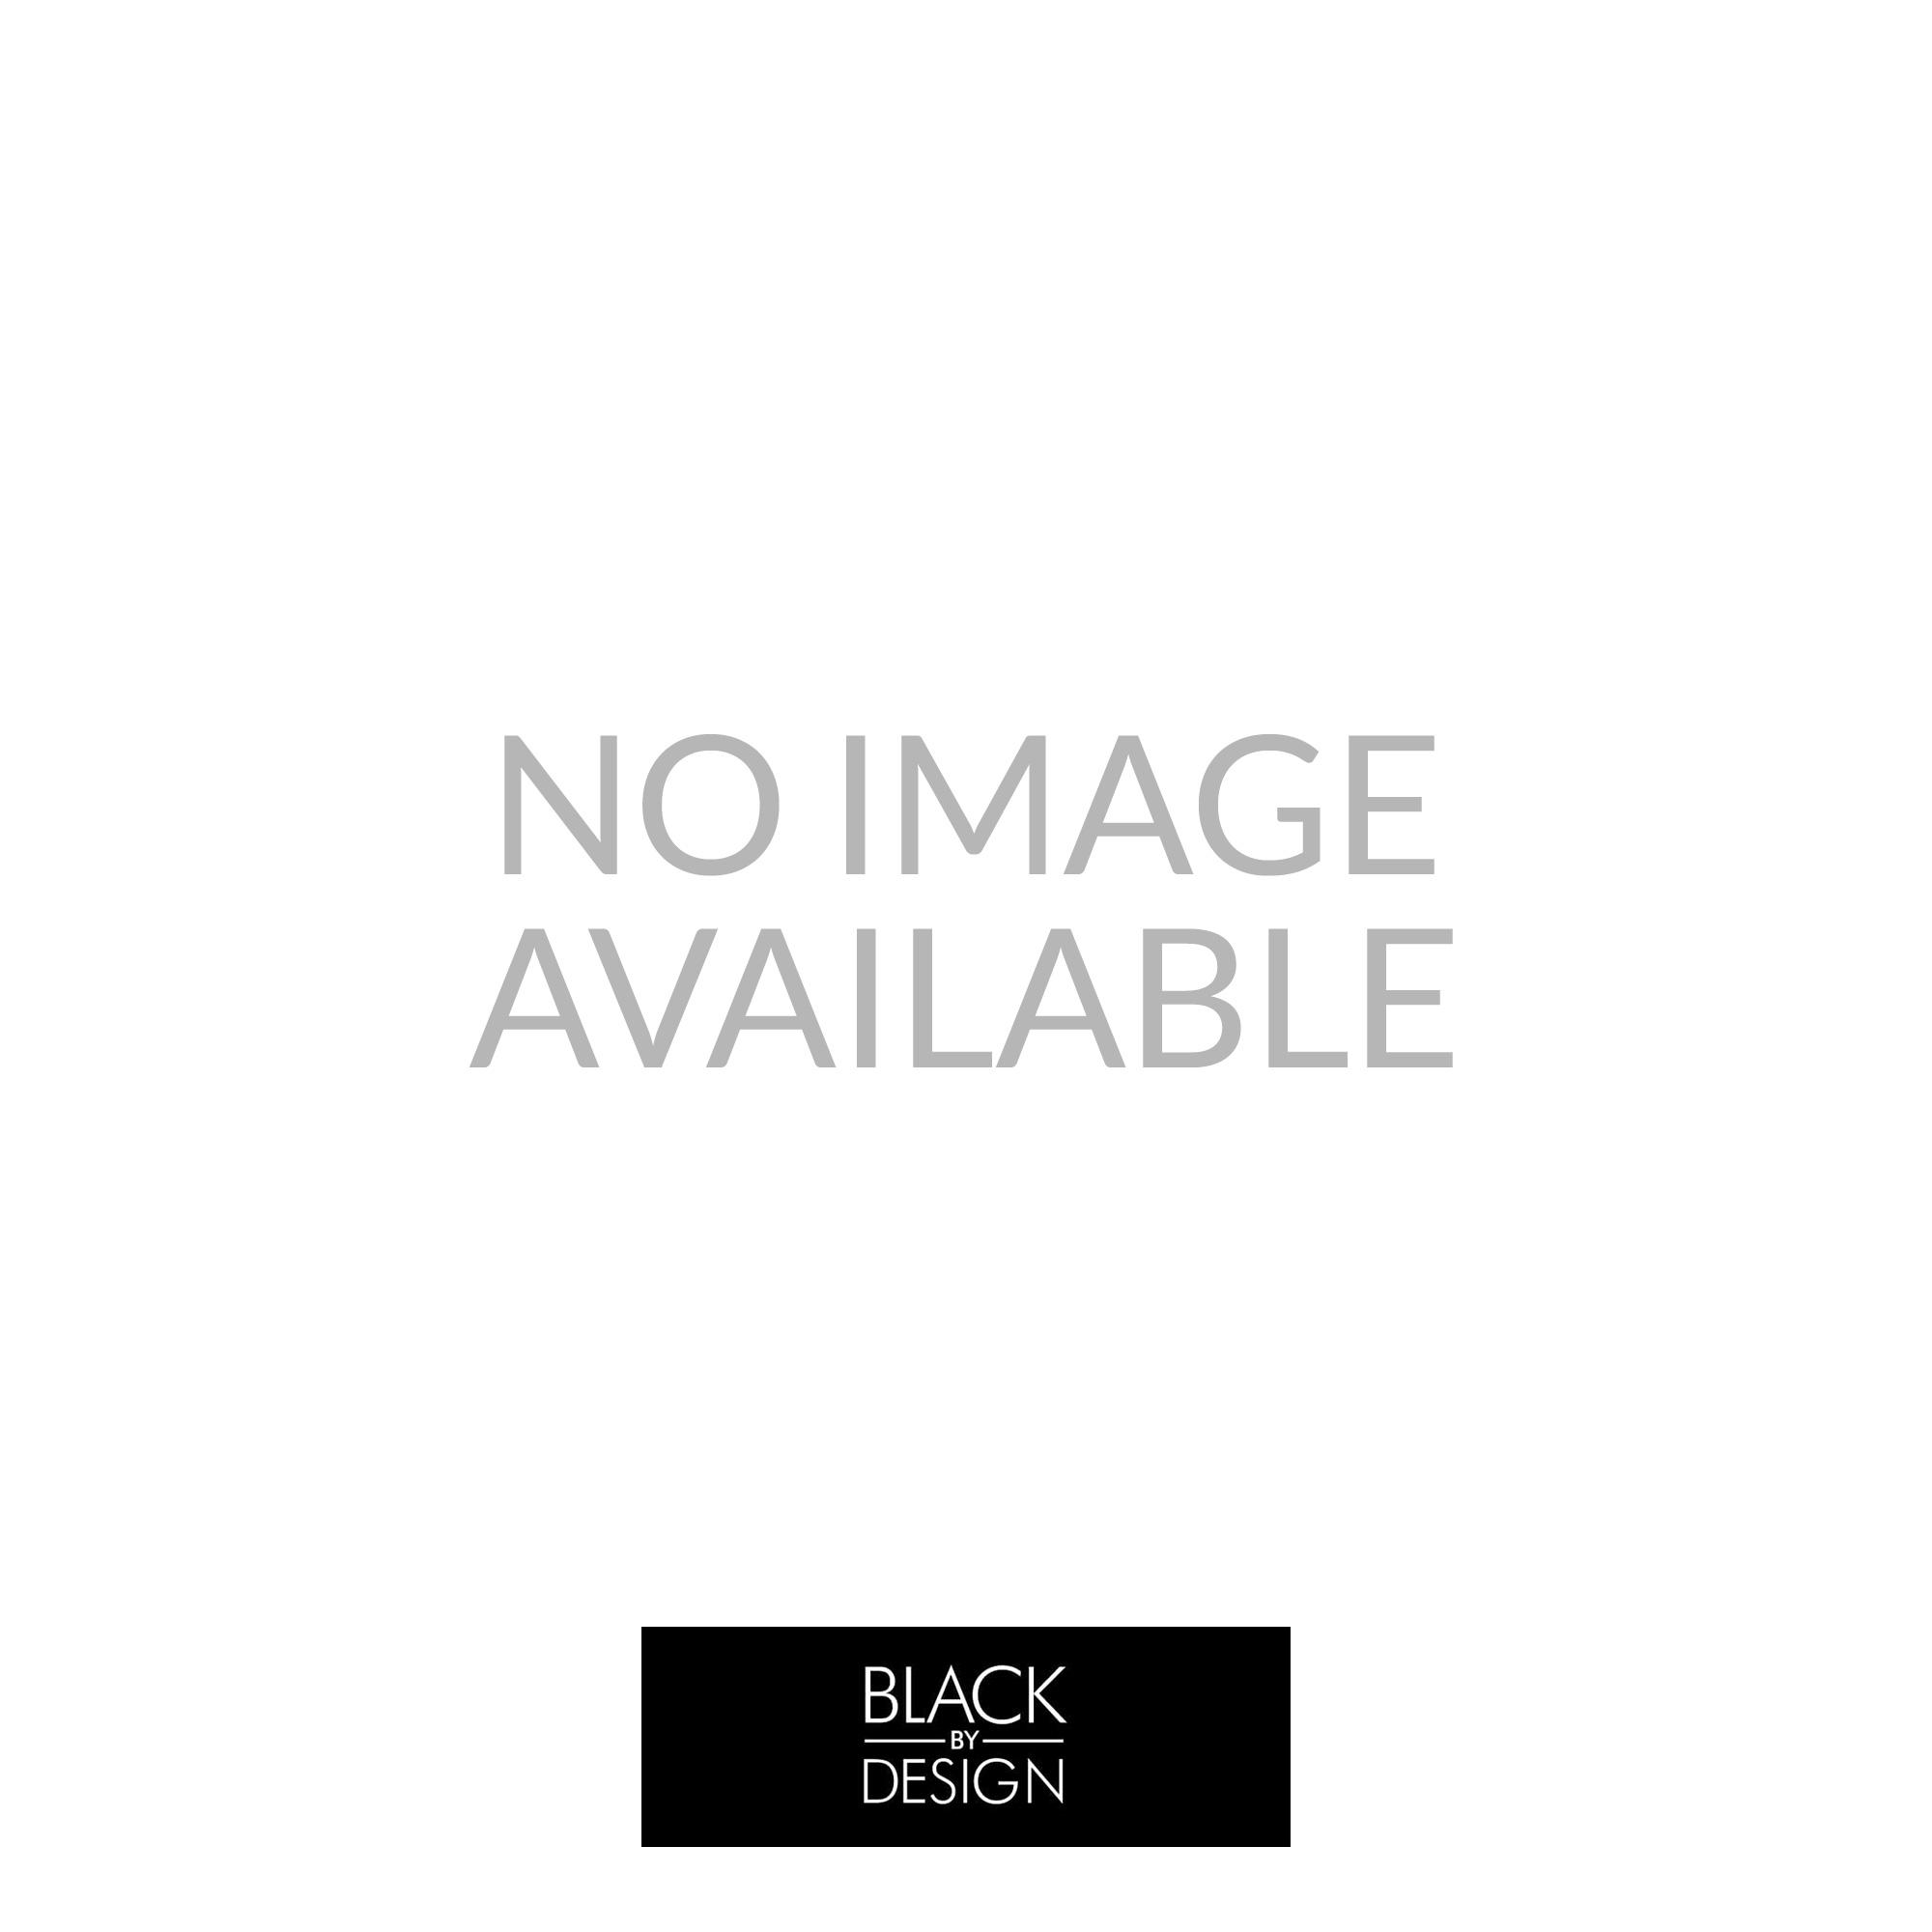 tweedmill cobweave throw english mustard black by design